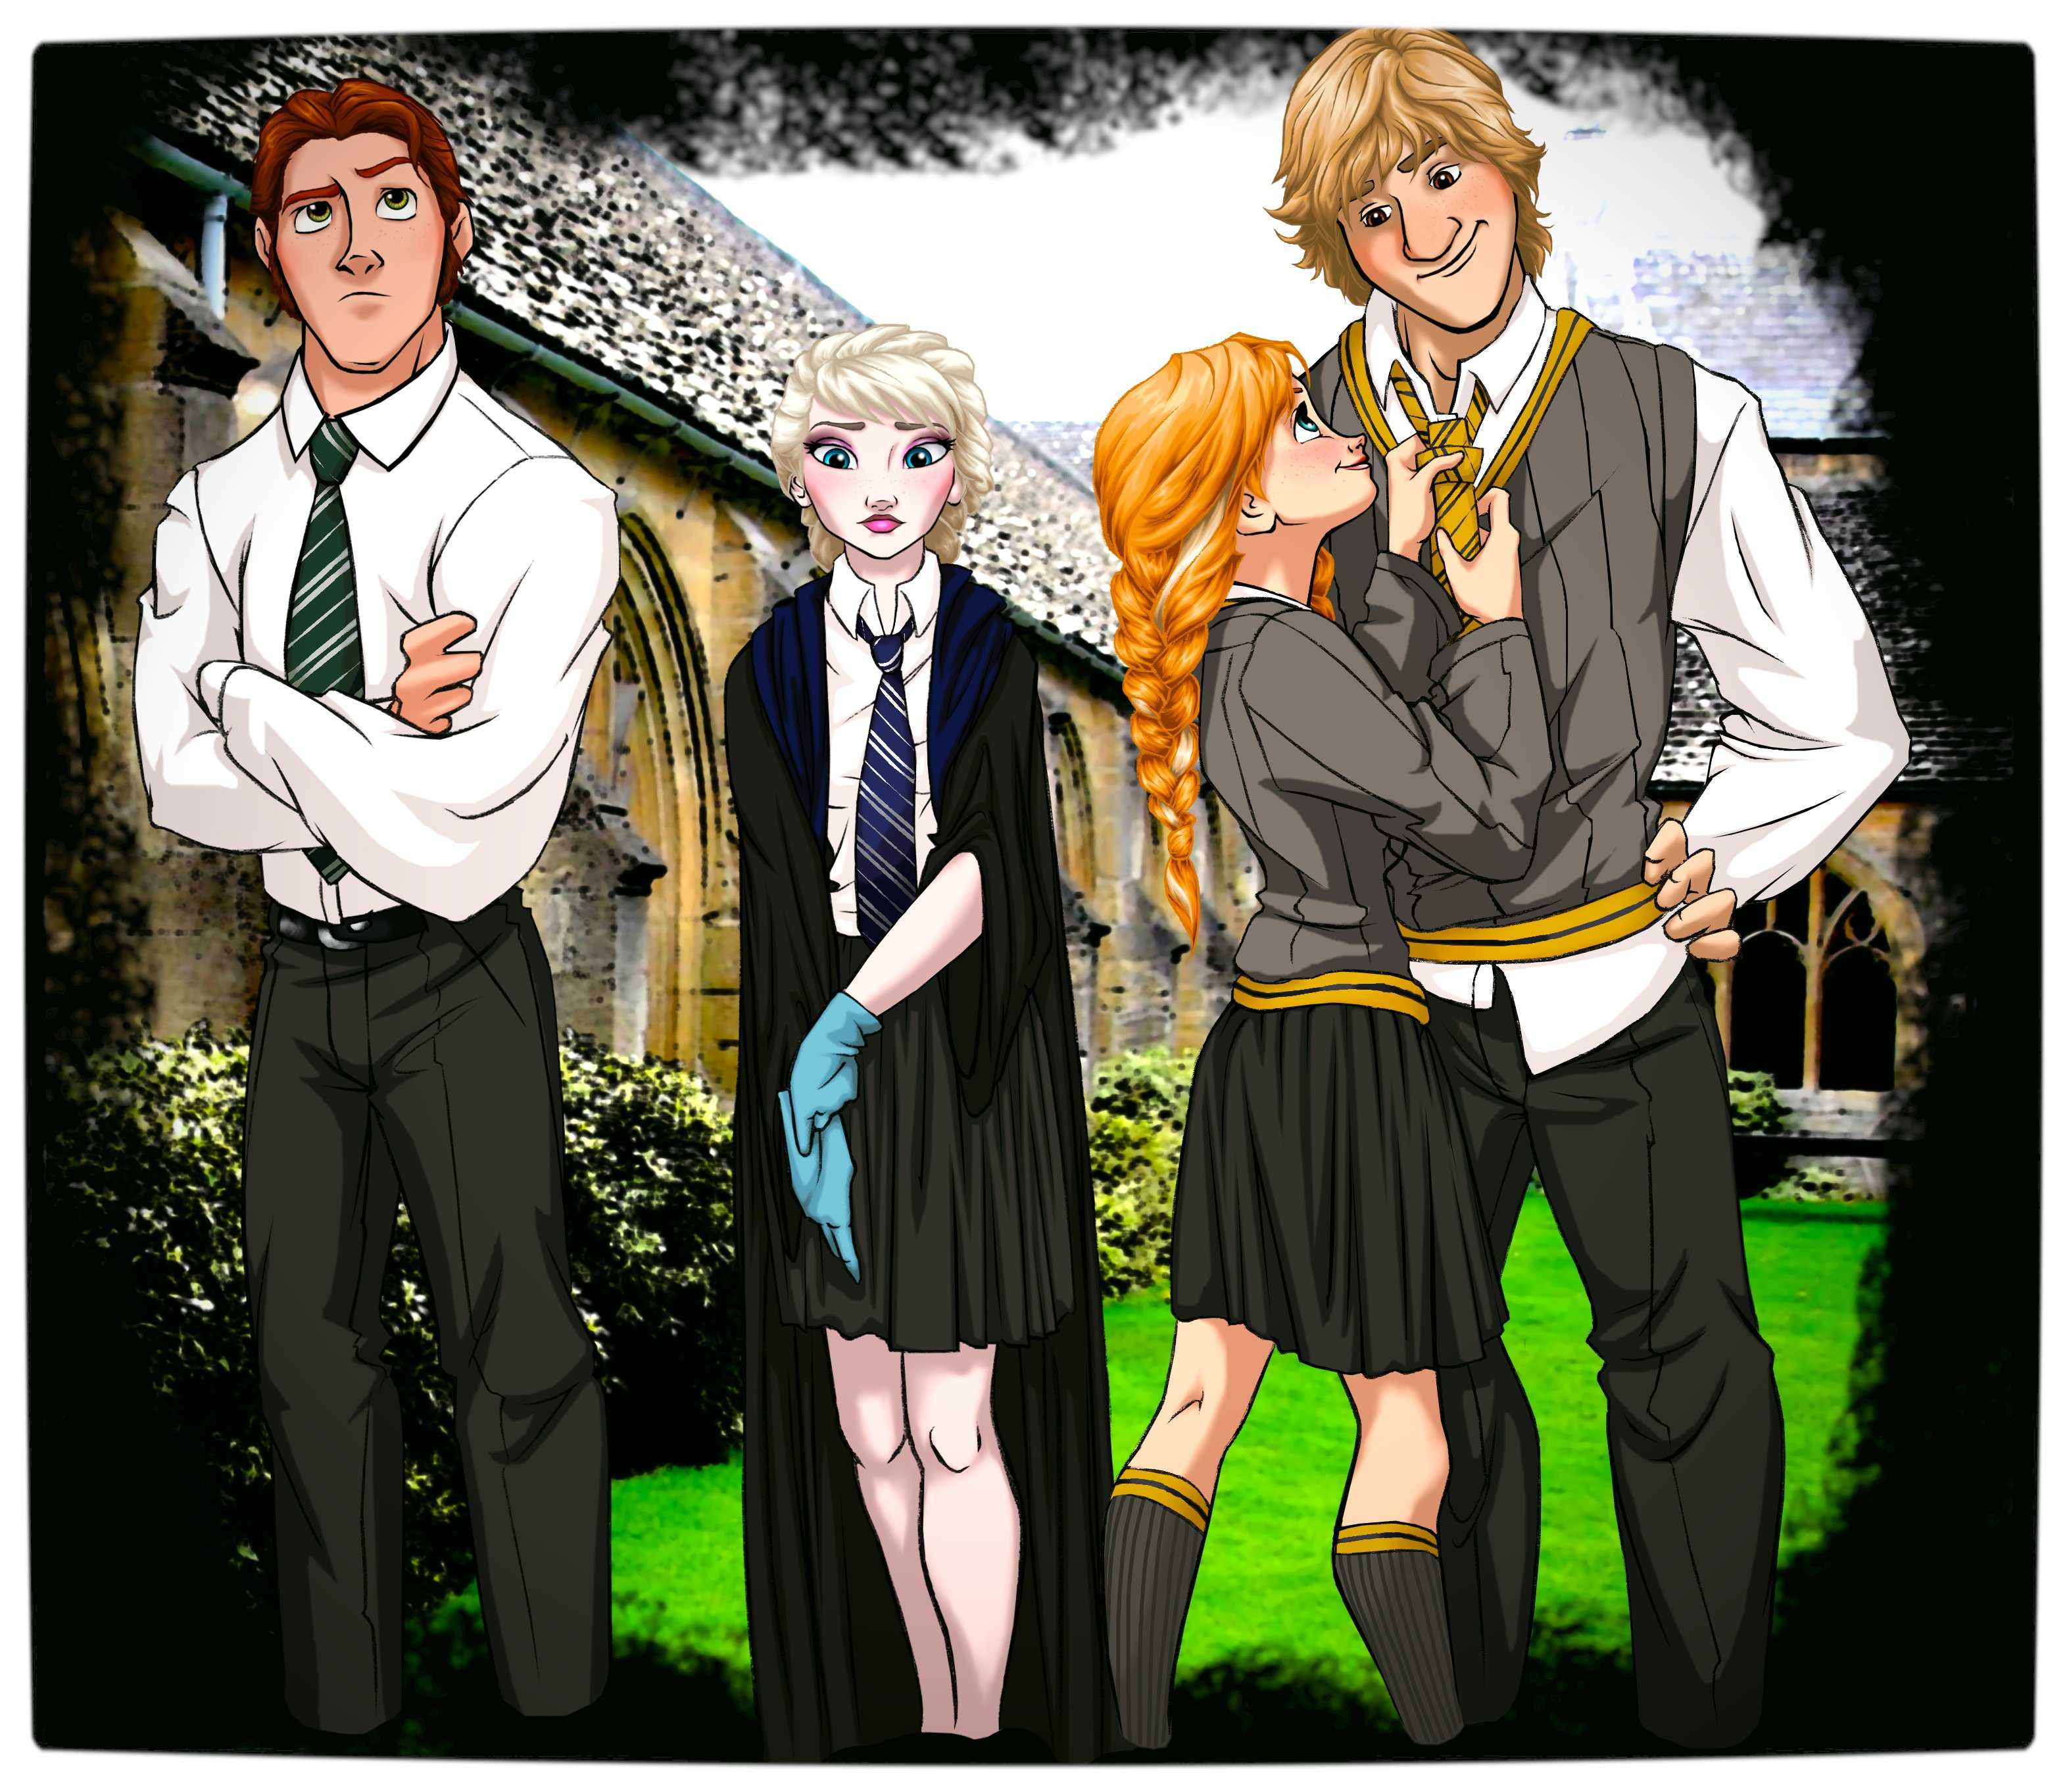 Disney At Hogwarts Imagines Disney Royalty As Harry